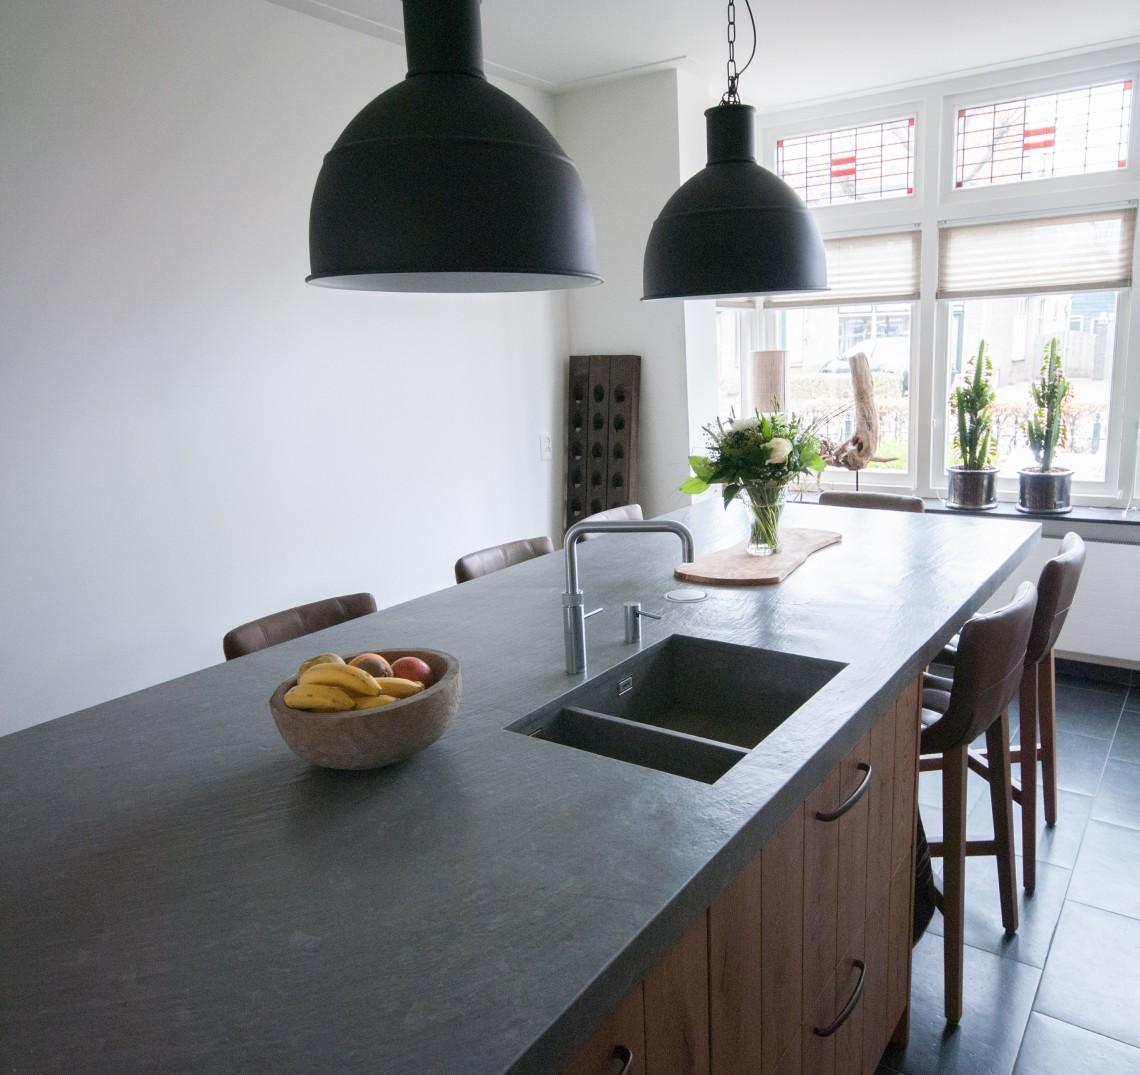 Massief eiken keuken met pitt cooking in hardinxveld giessendam ...